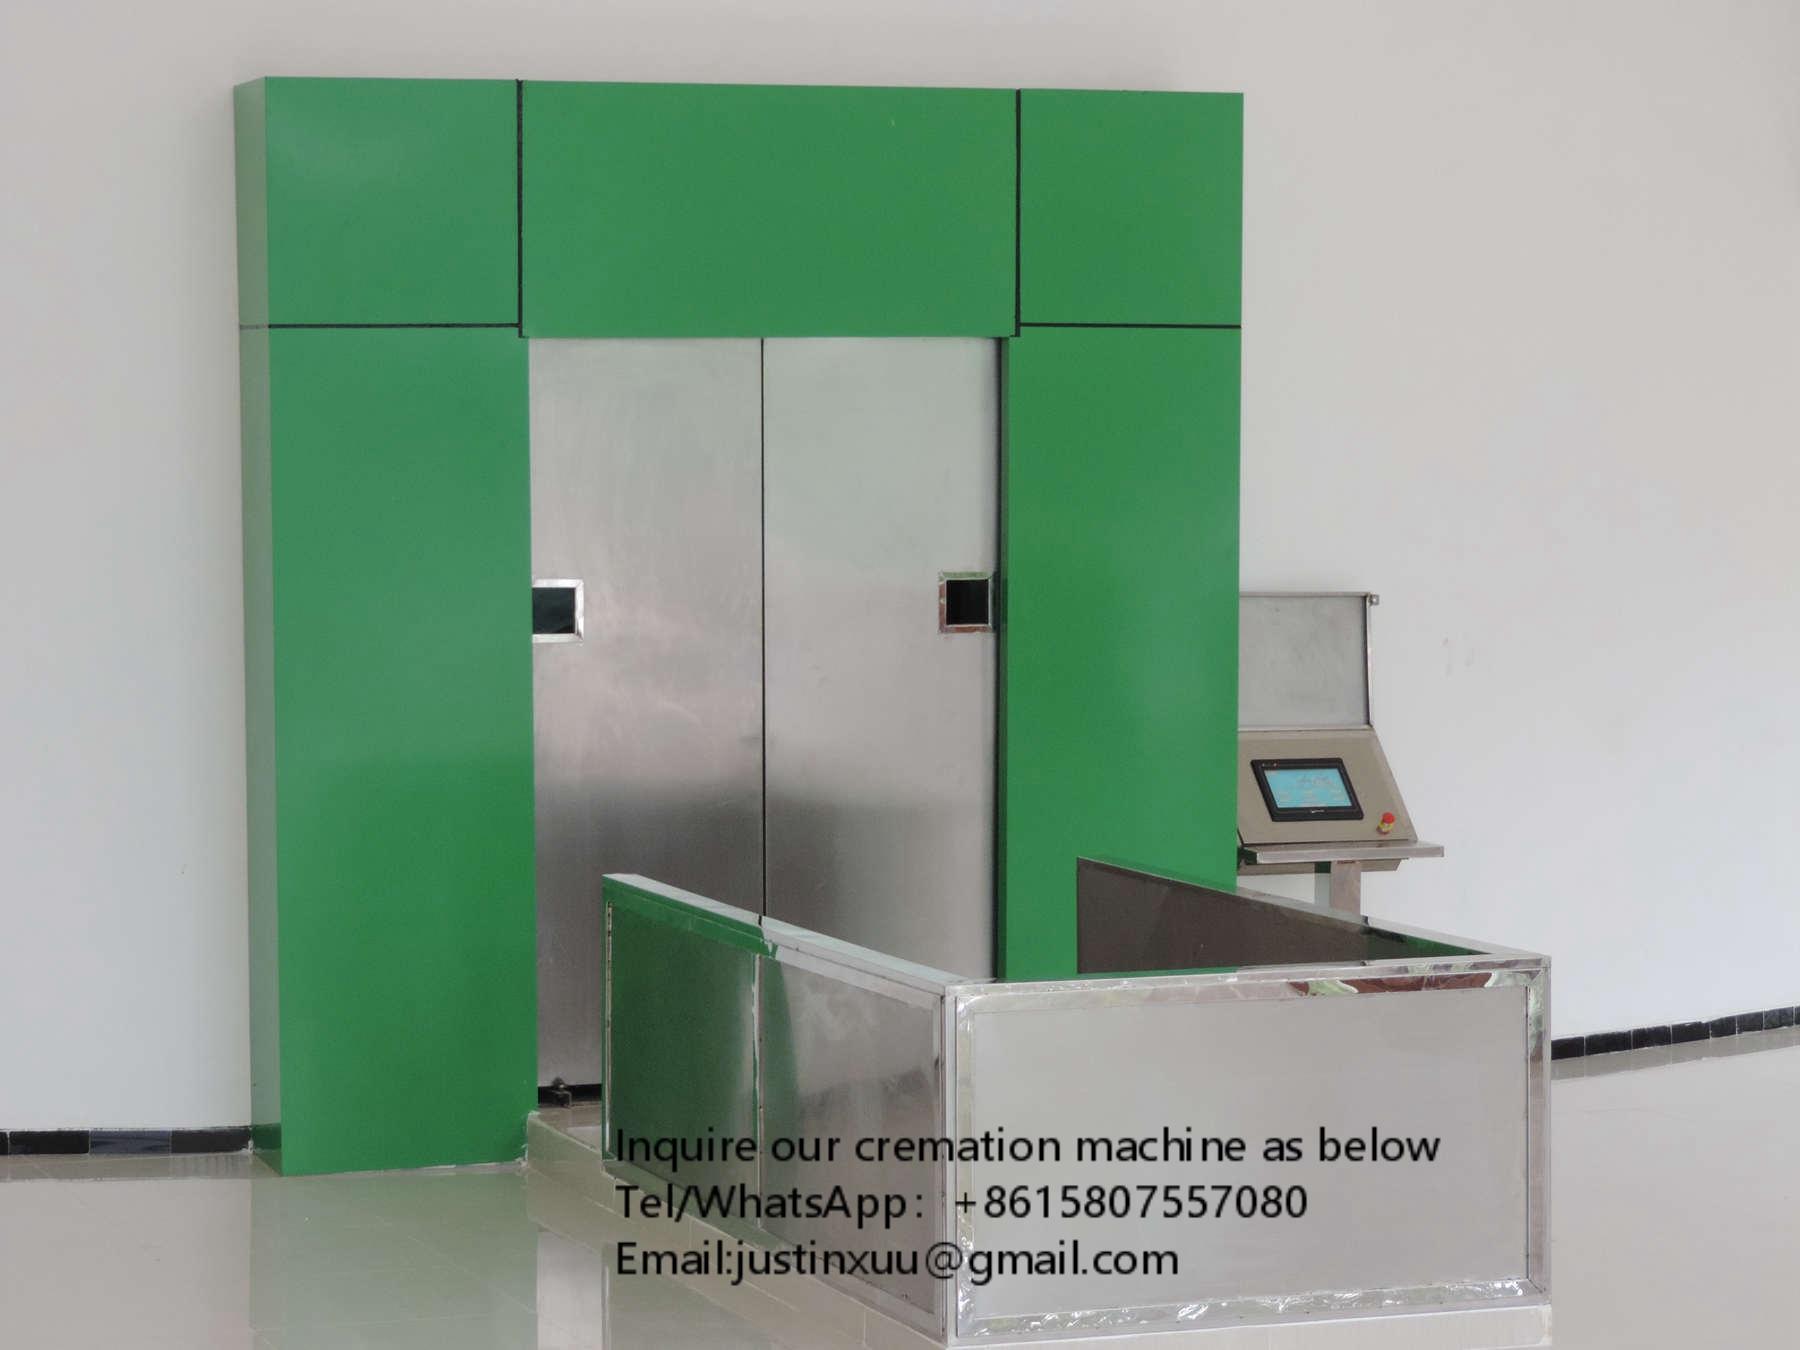 Crematorium Machine for sale from china  designed for Columbia market 3